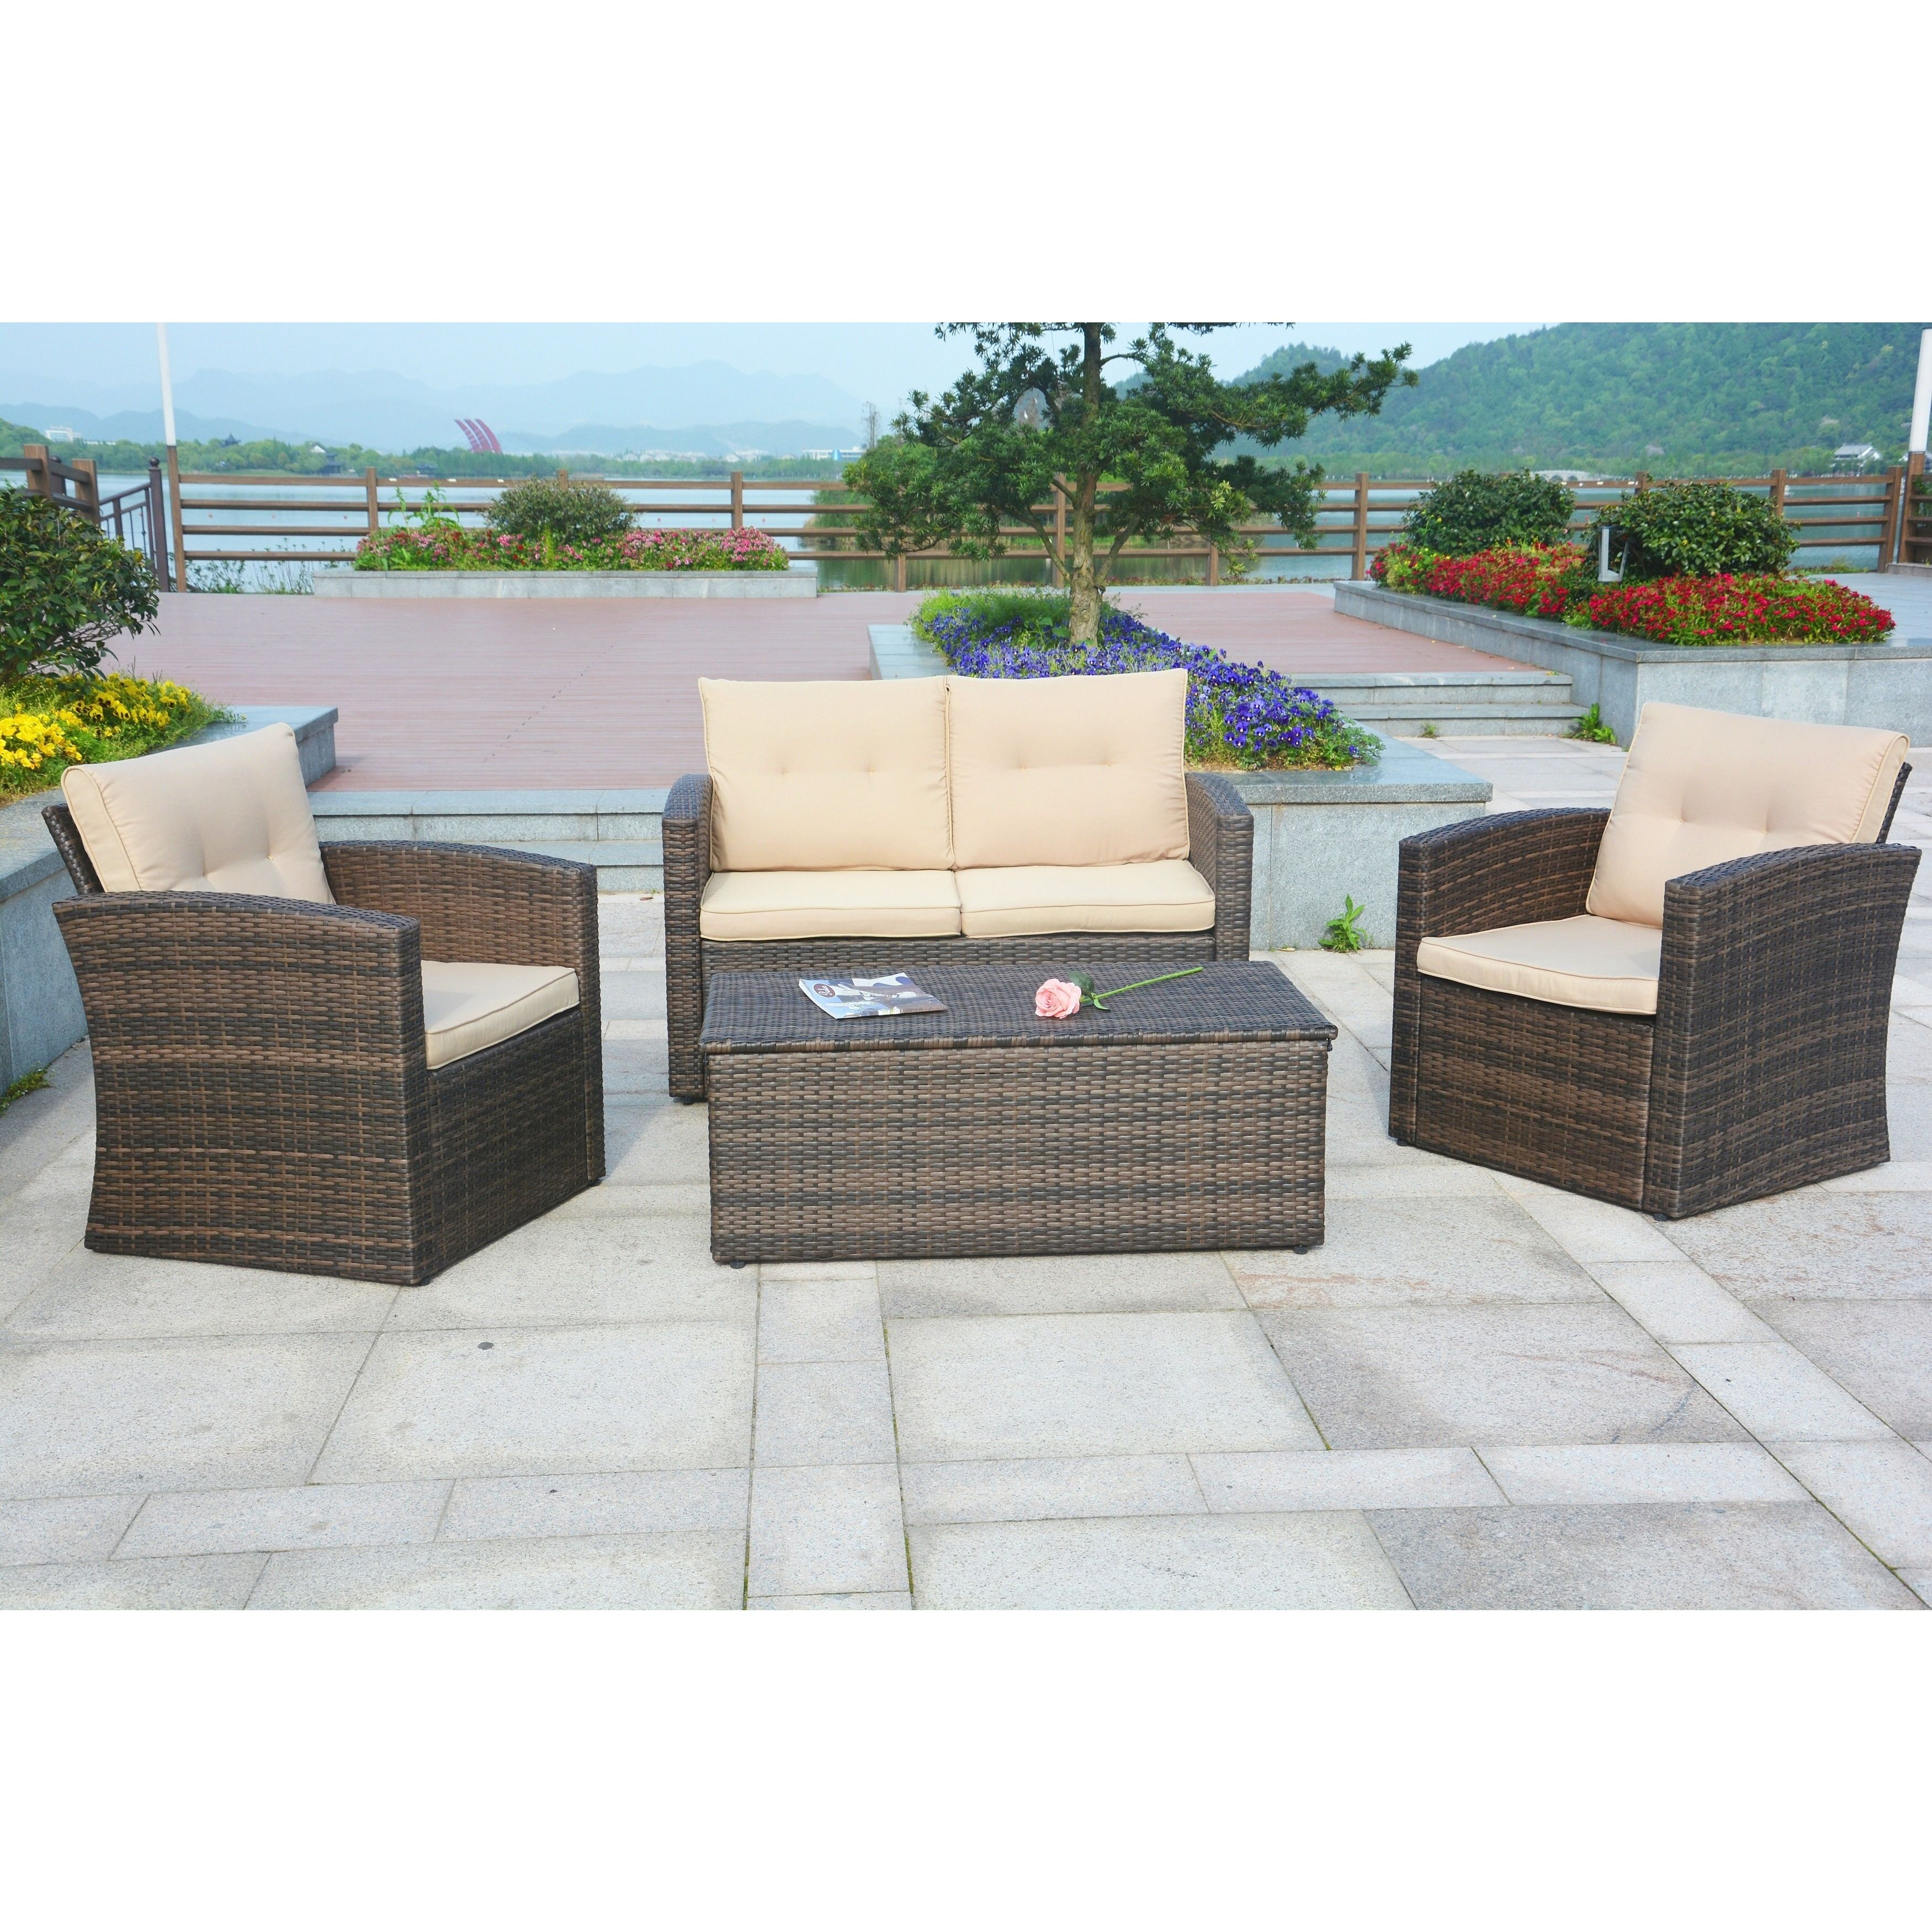 Puerta 4 piece Outdoor Wicker Patio Sofa Set with Cushion Box